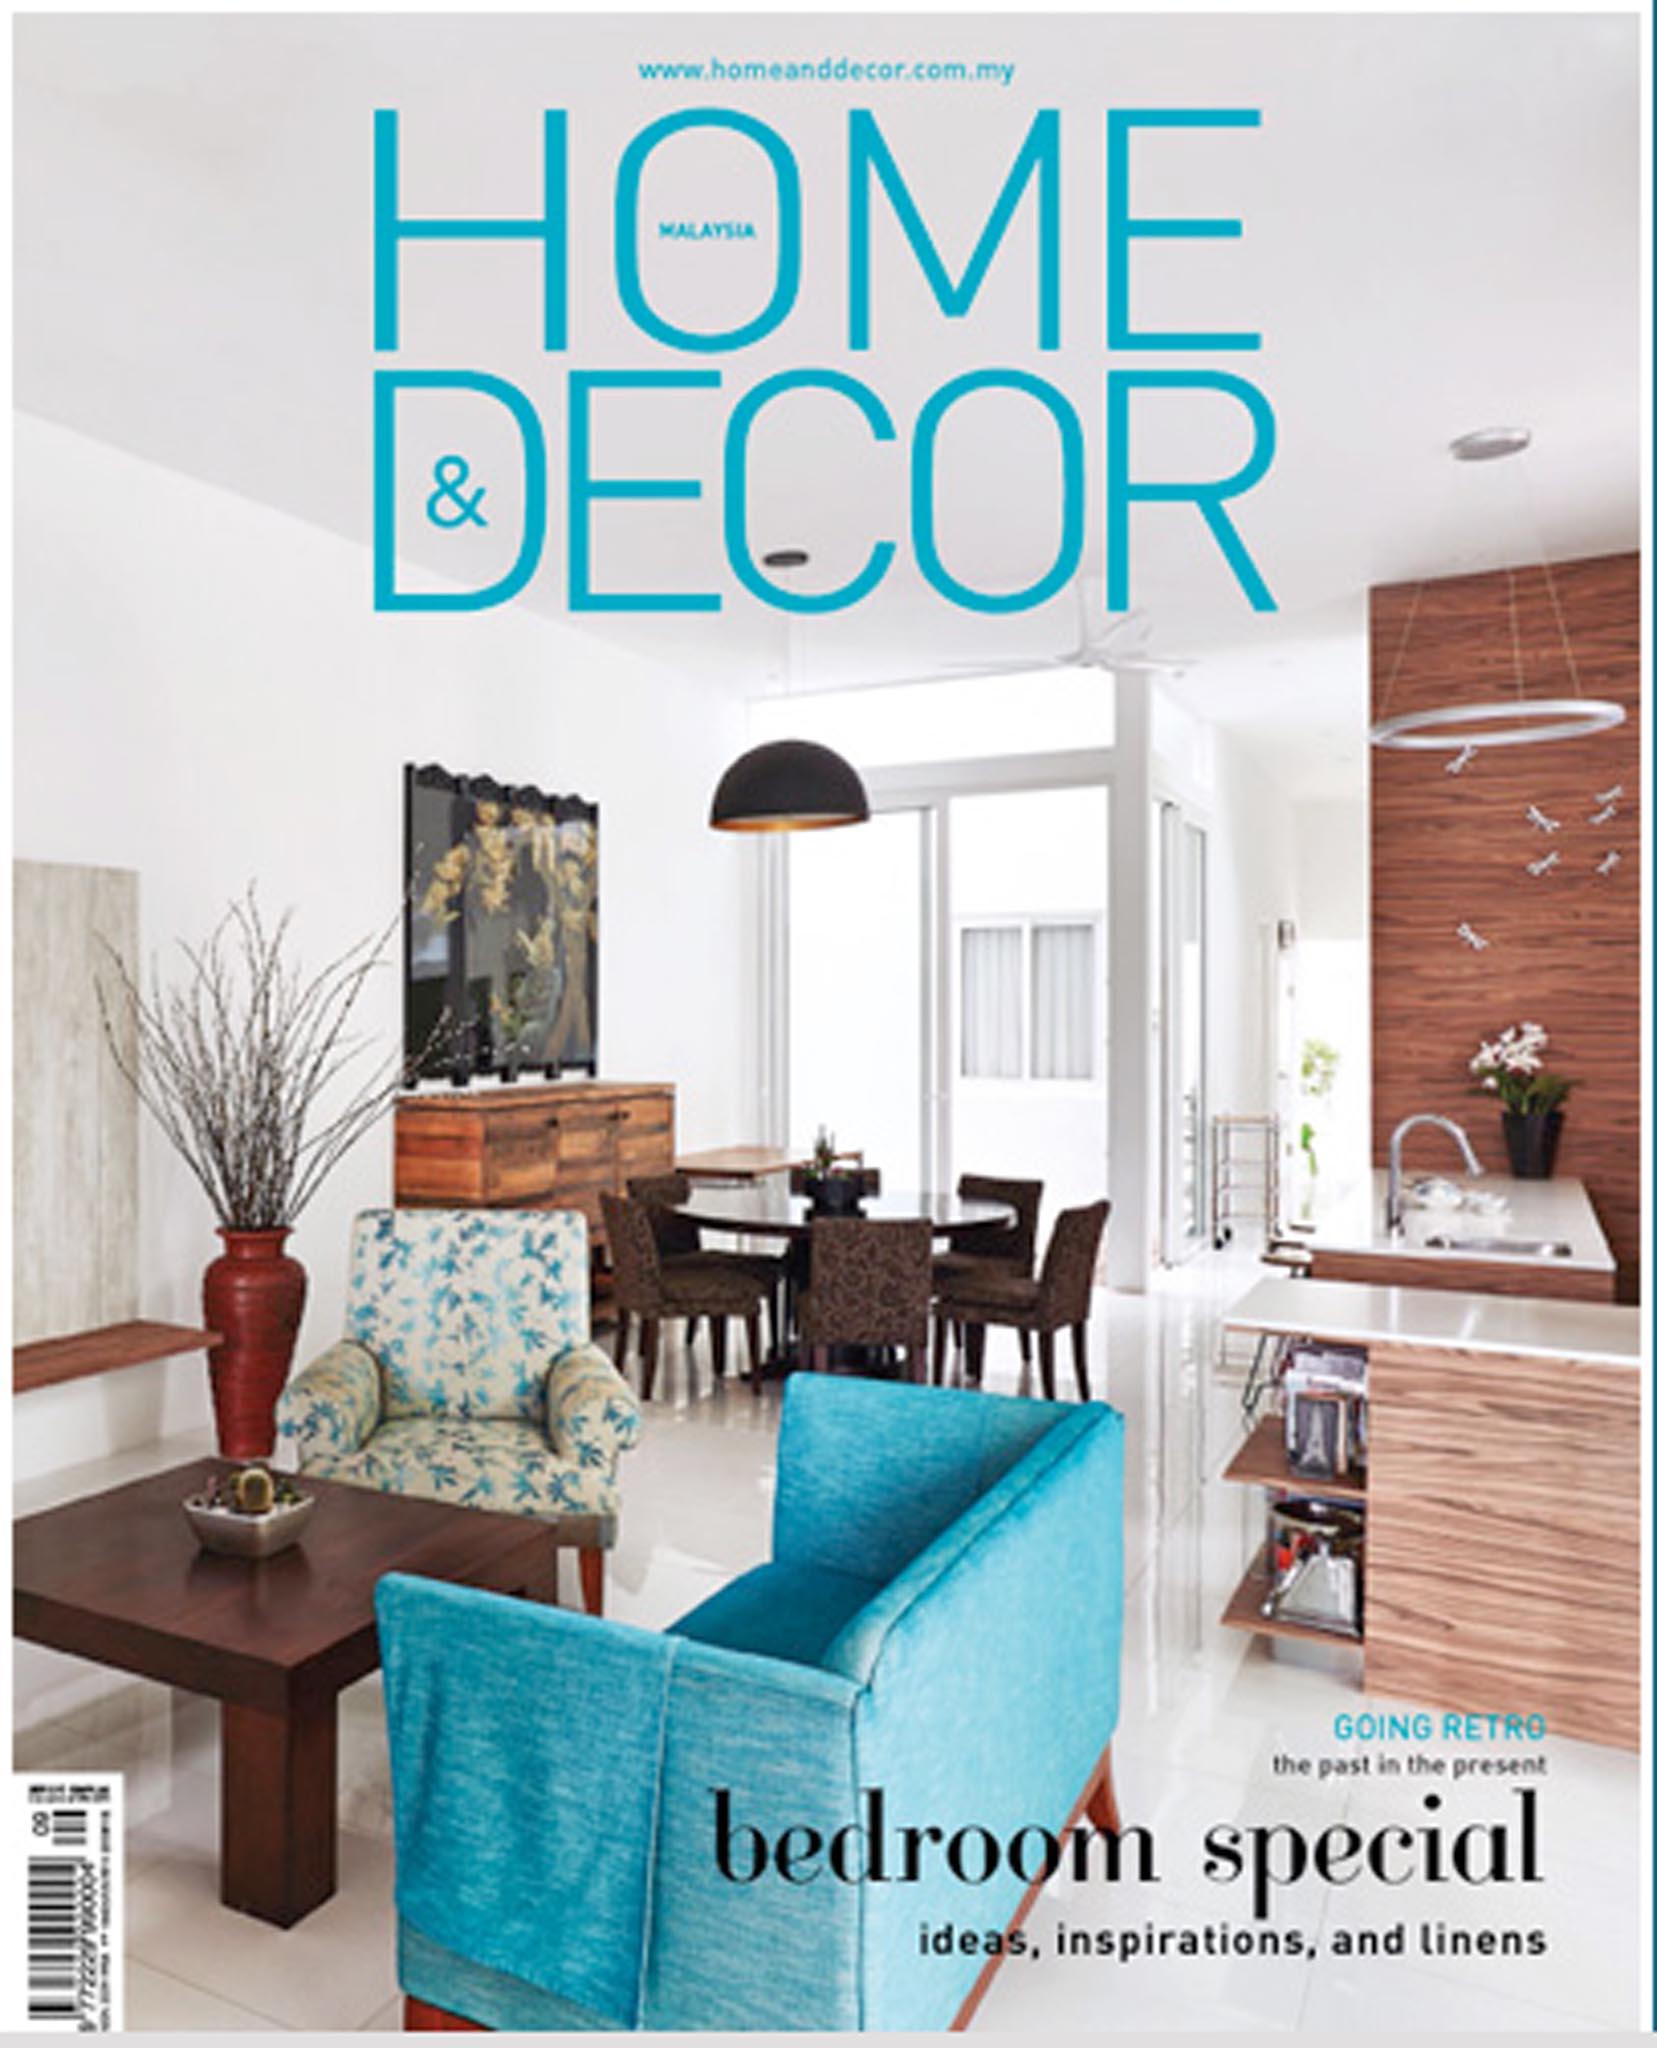 Home & Decor Malaysia, September 2015 Issue